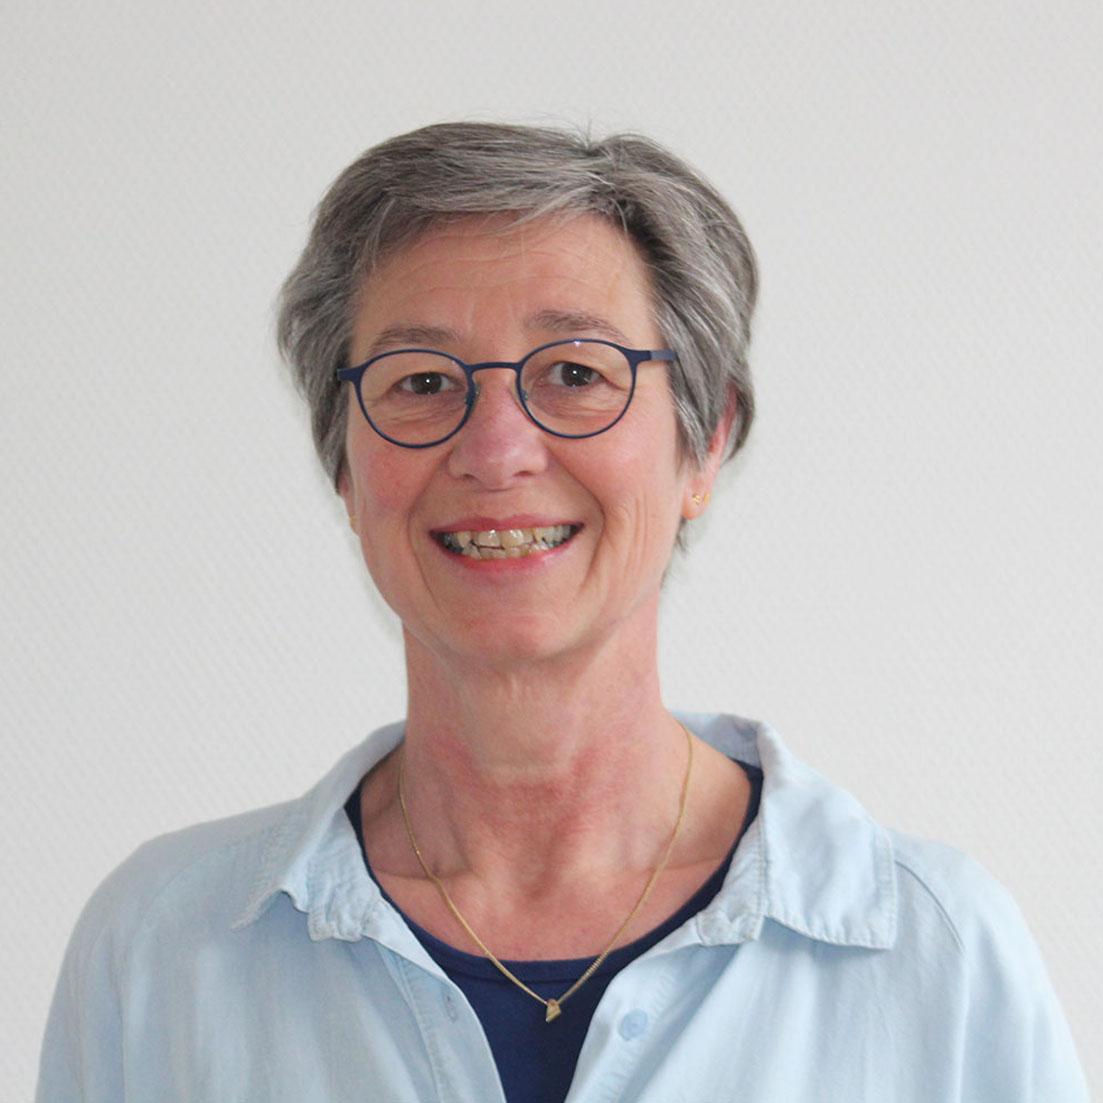 Christa Ringlever